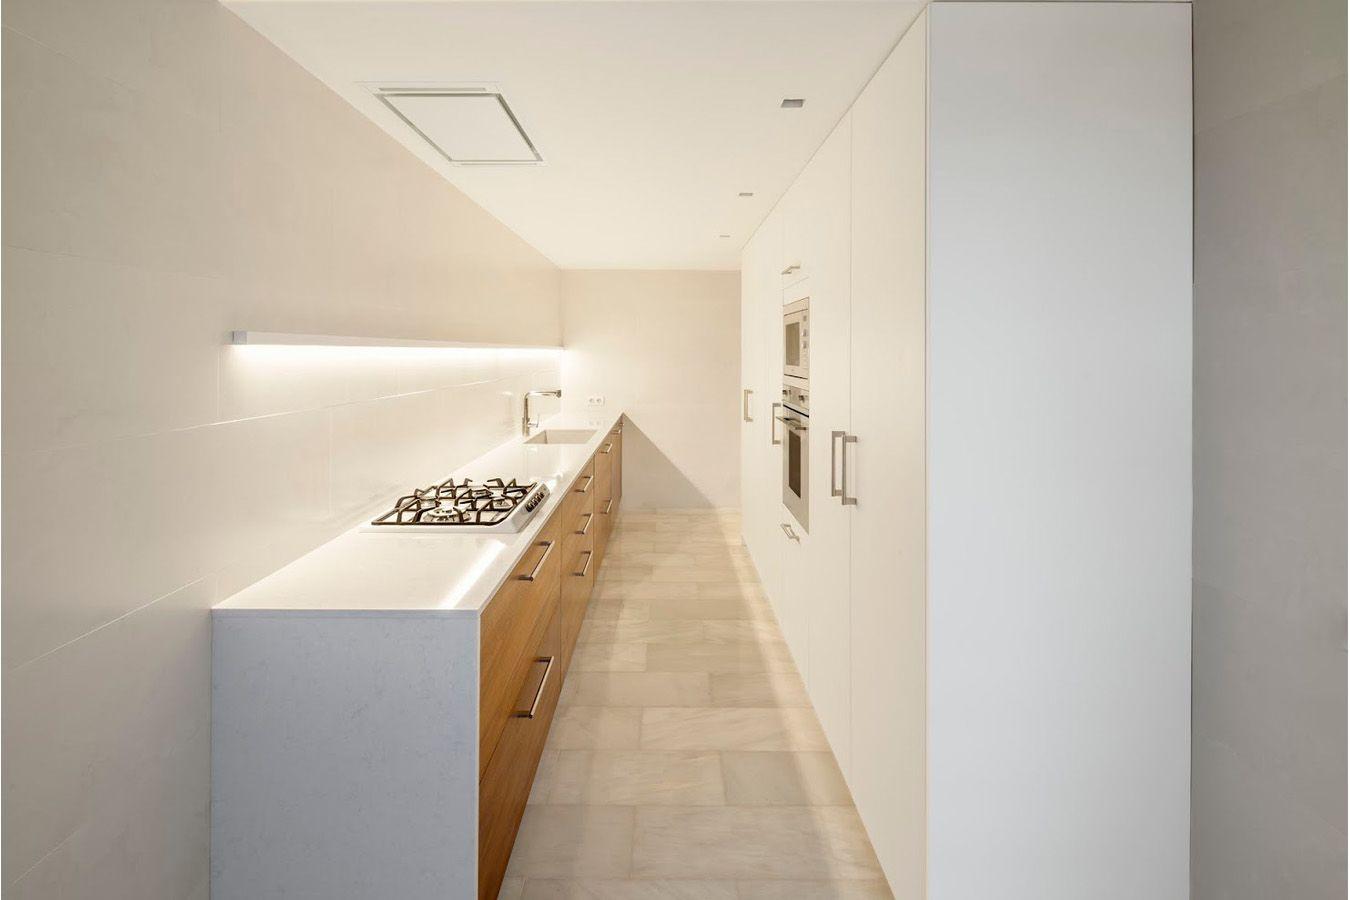 Smalle Keuken Ideeen.Lange Smalle Witte Keuken Met Houten Kastjes Huisje Keuken